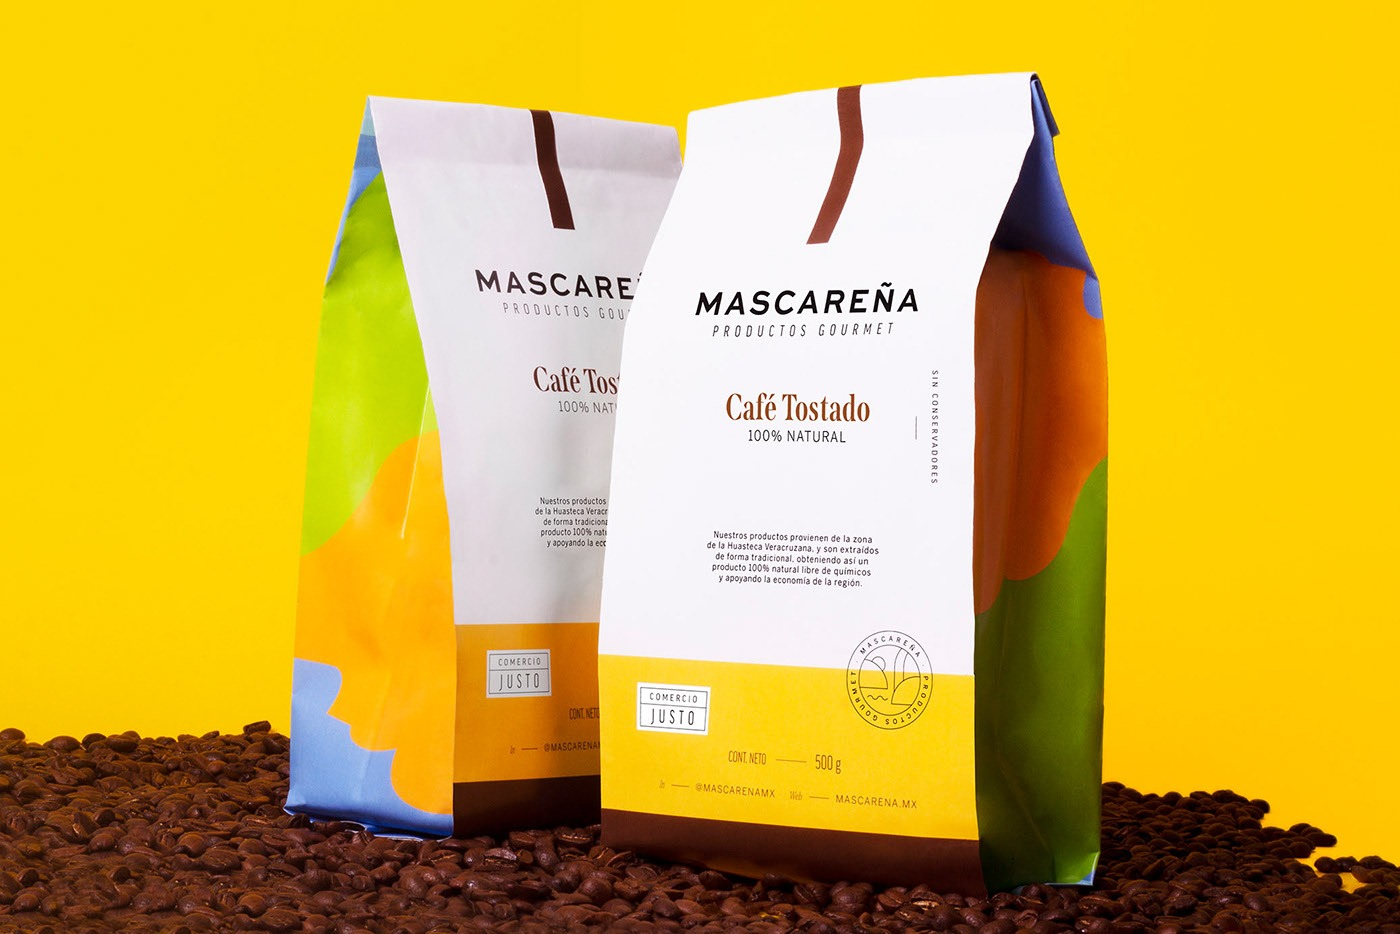 Mascareña天然食品包装设计